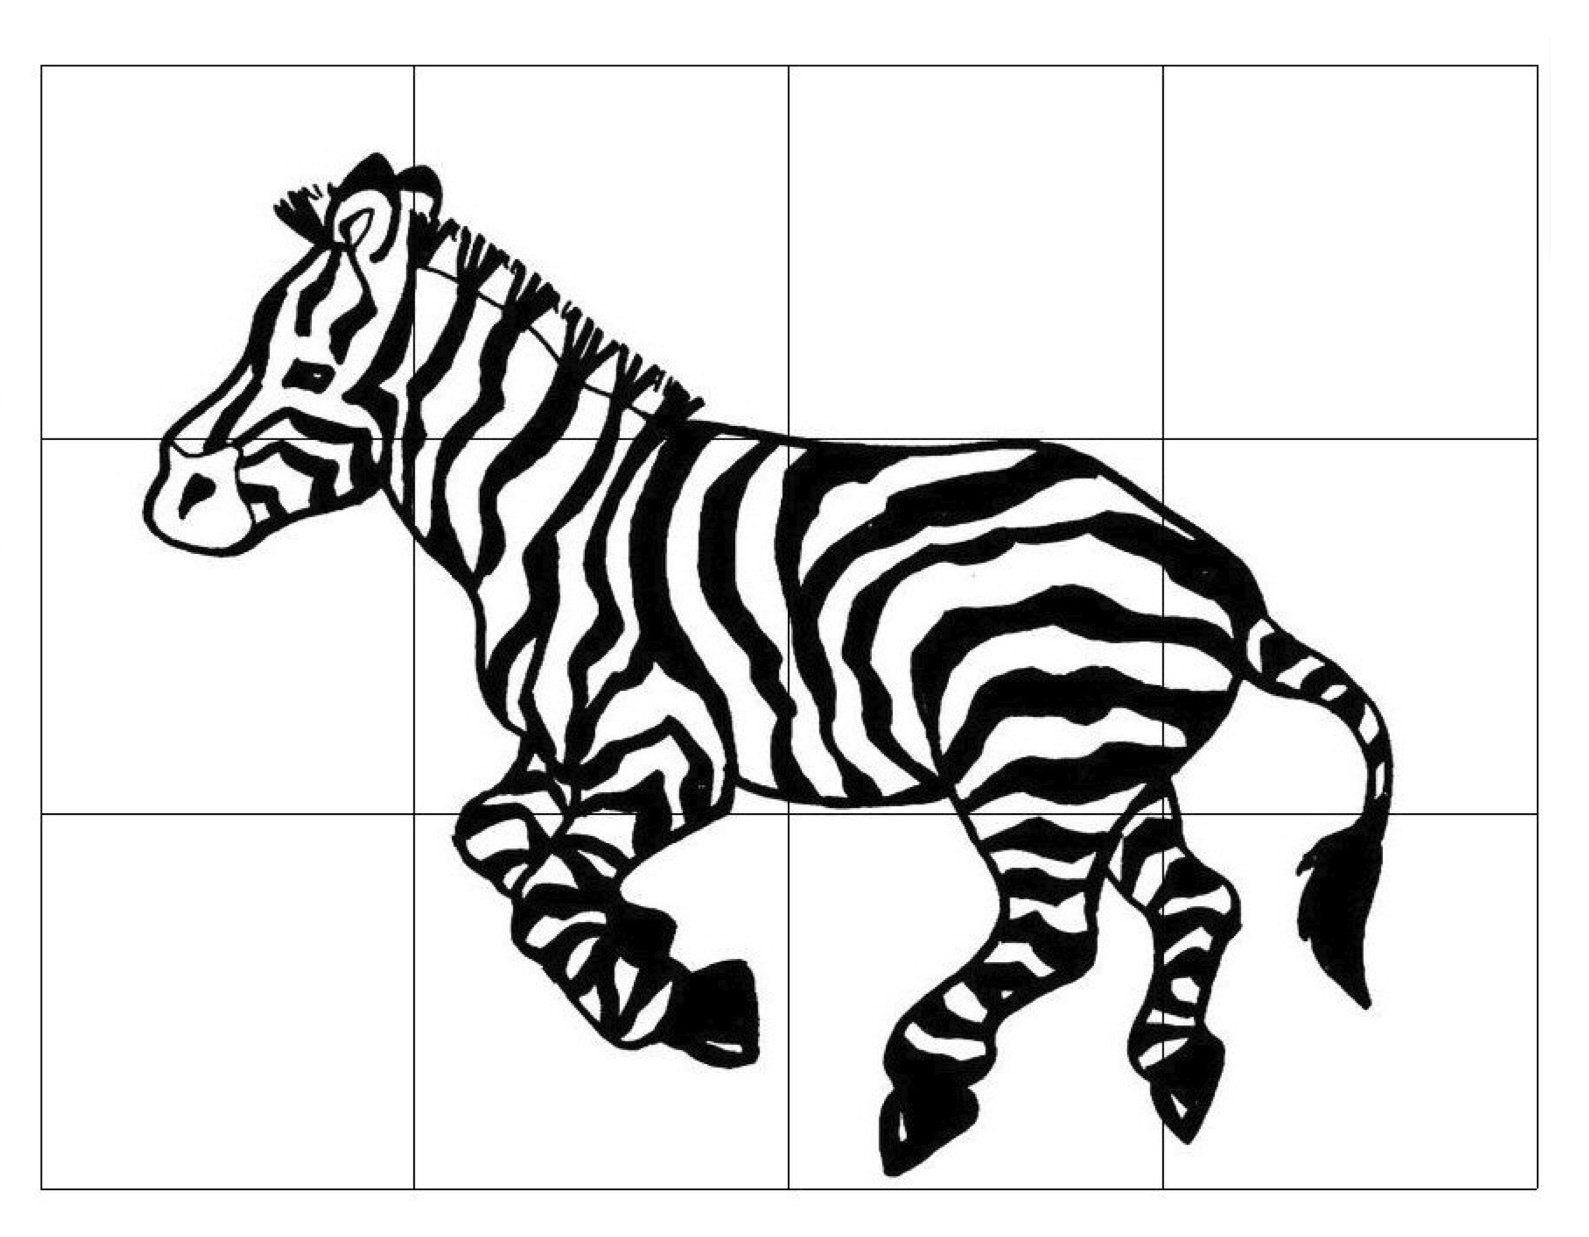 Zebra-Puzzle-For-Kids | Képek-Állatok - Zebra Puzzle, Animal Crafts - Printable Zebra Puzzles